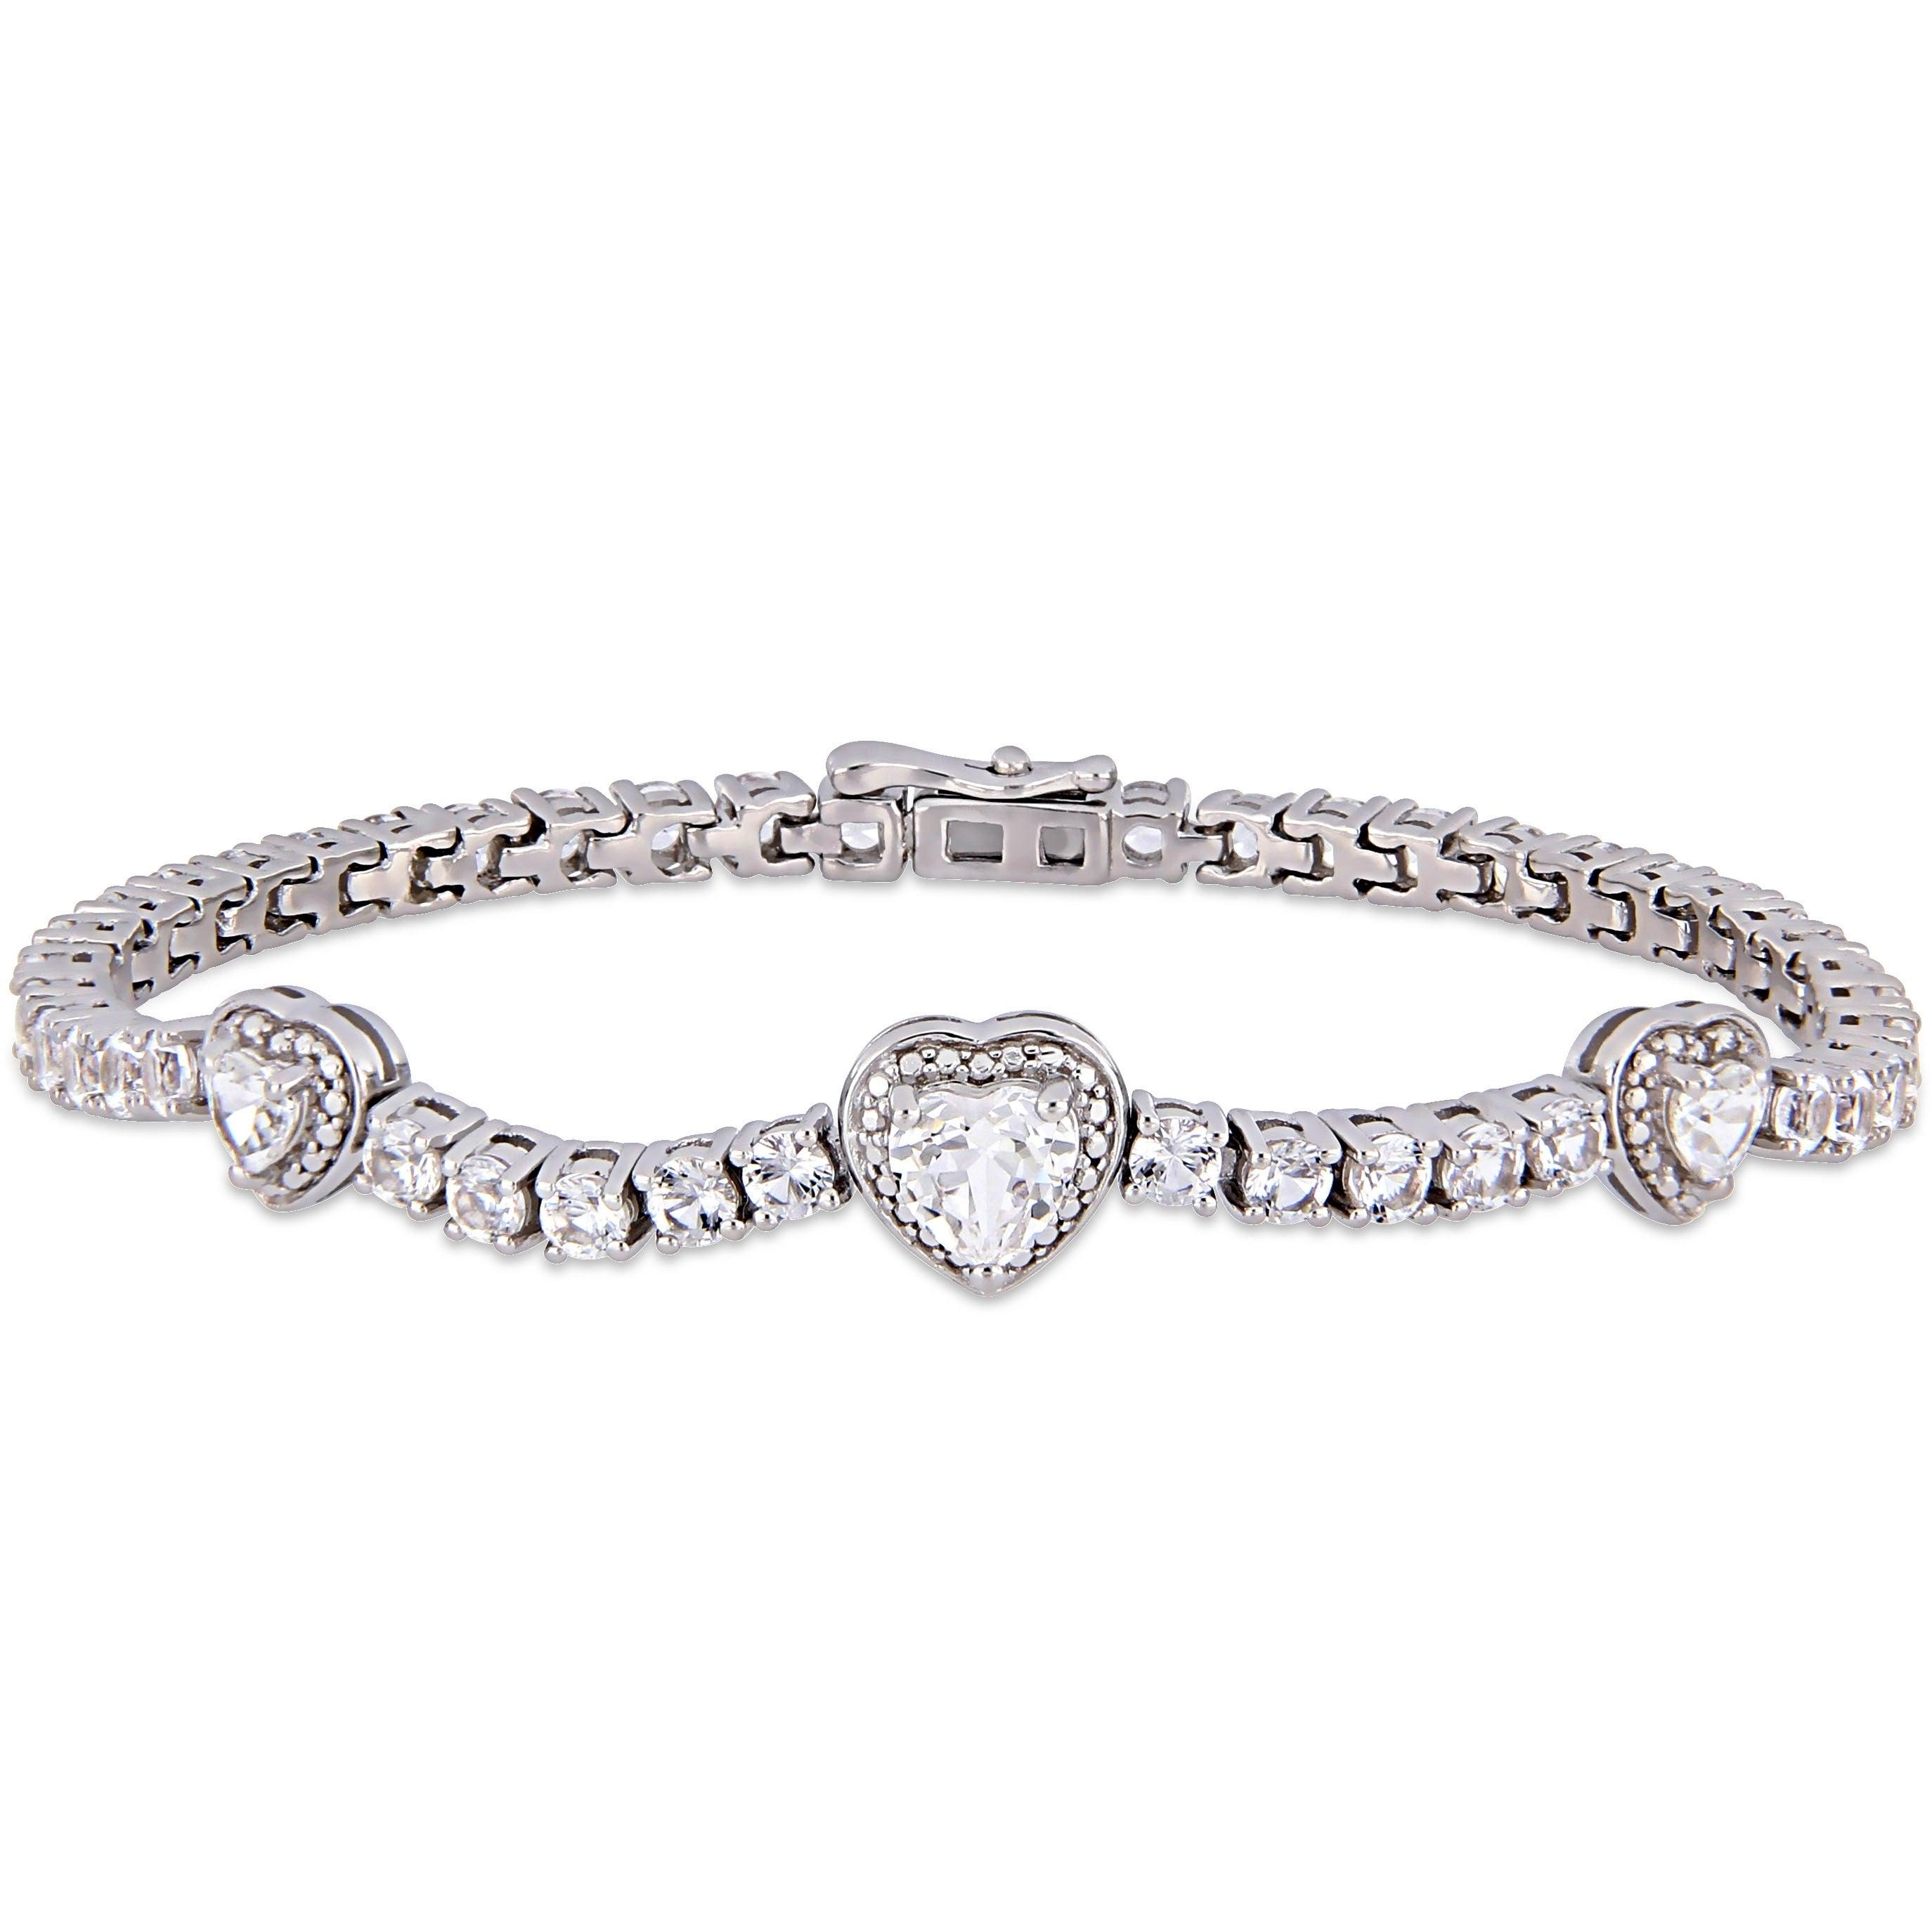 "PLATINUM STERLING SILVER DIAMOND SET WHITE SAPPHIRE 7/"" TENNIS DESIGN BRACELET"